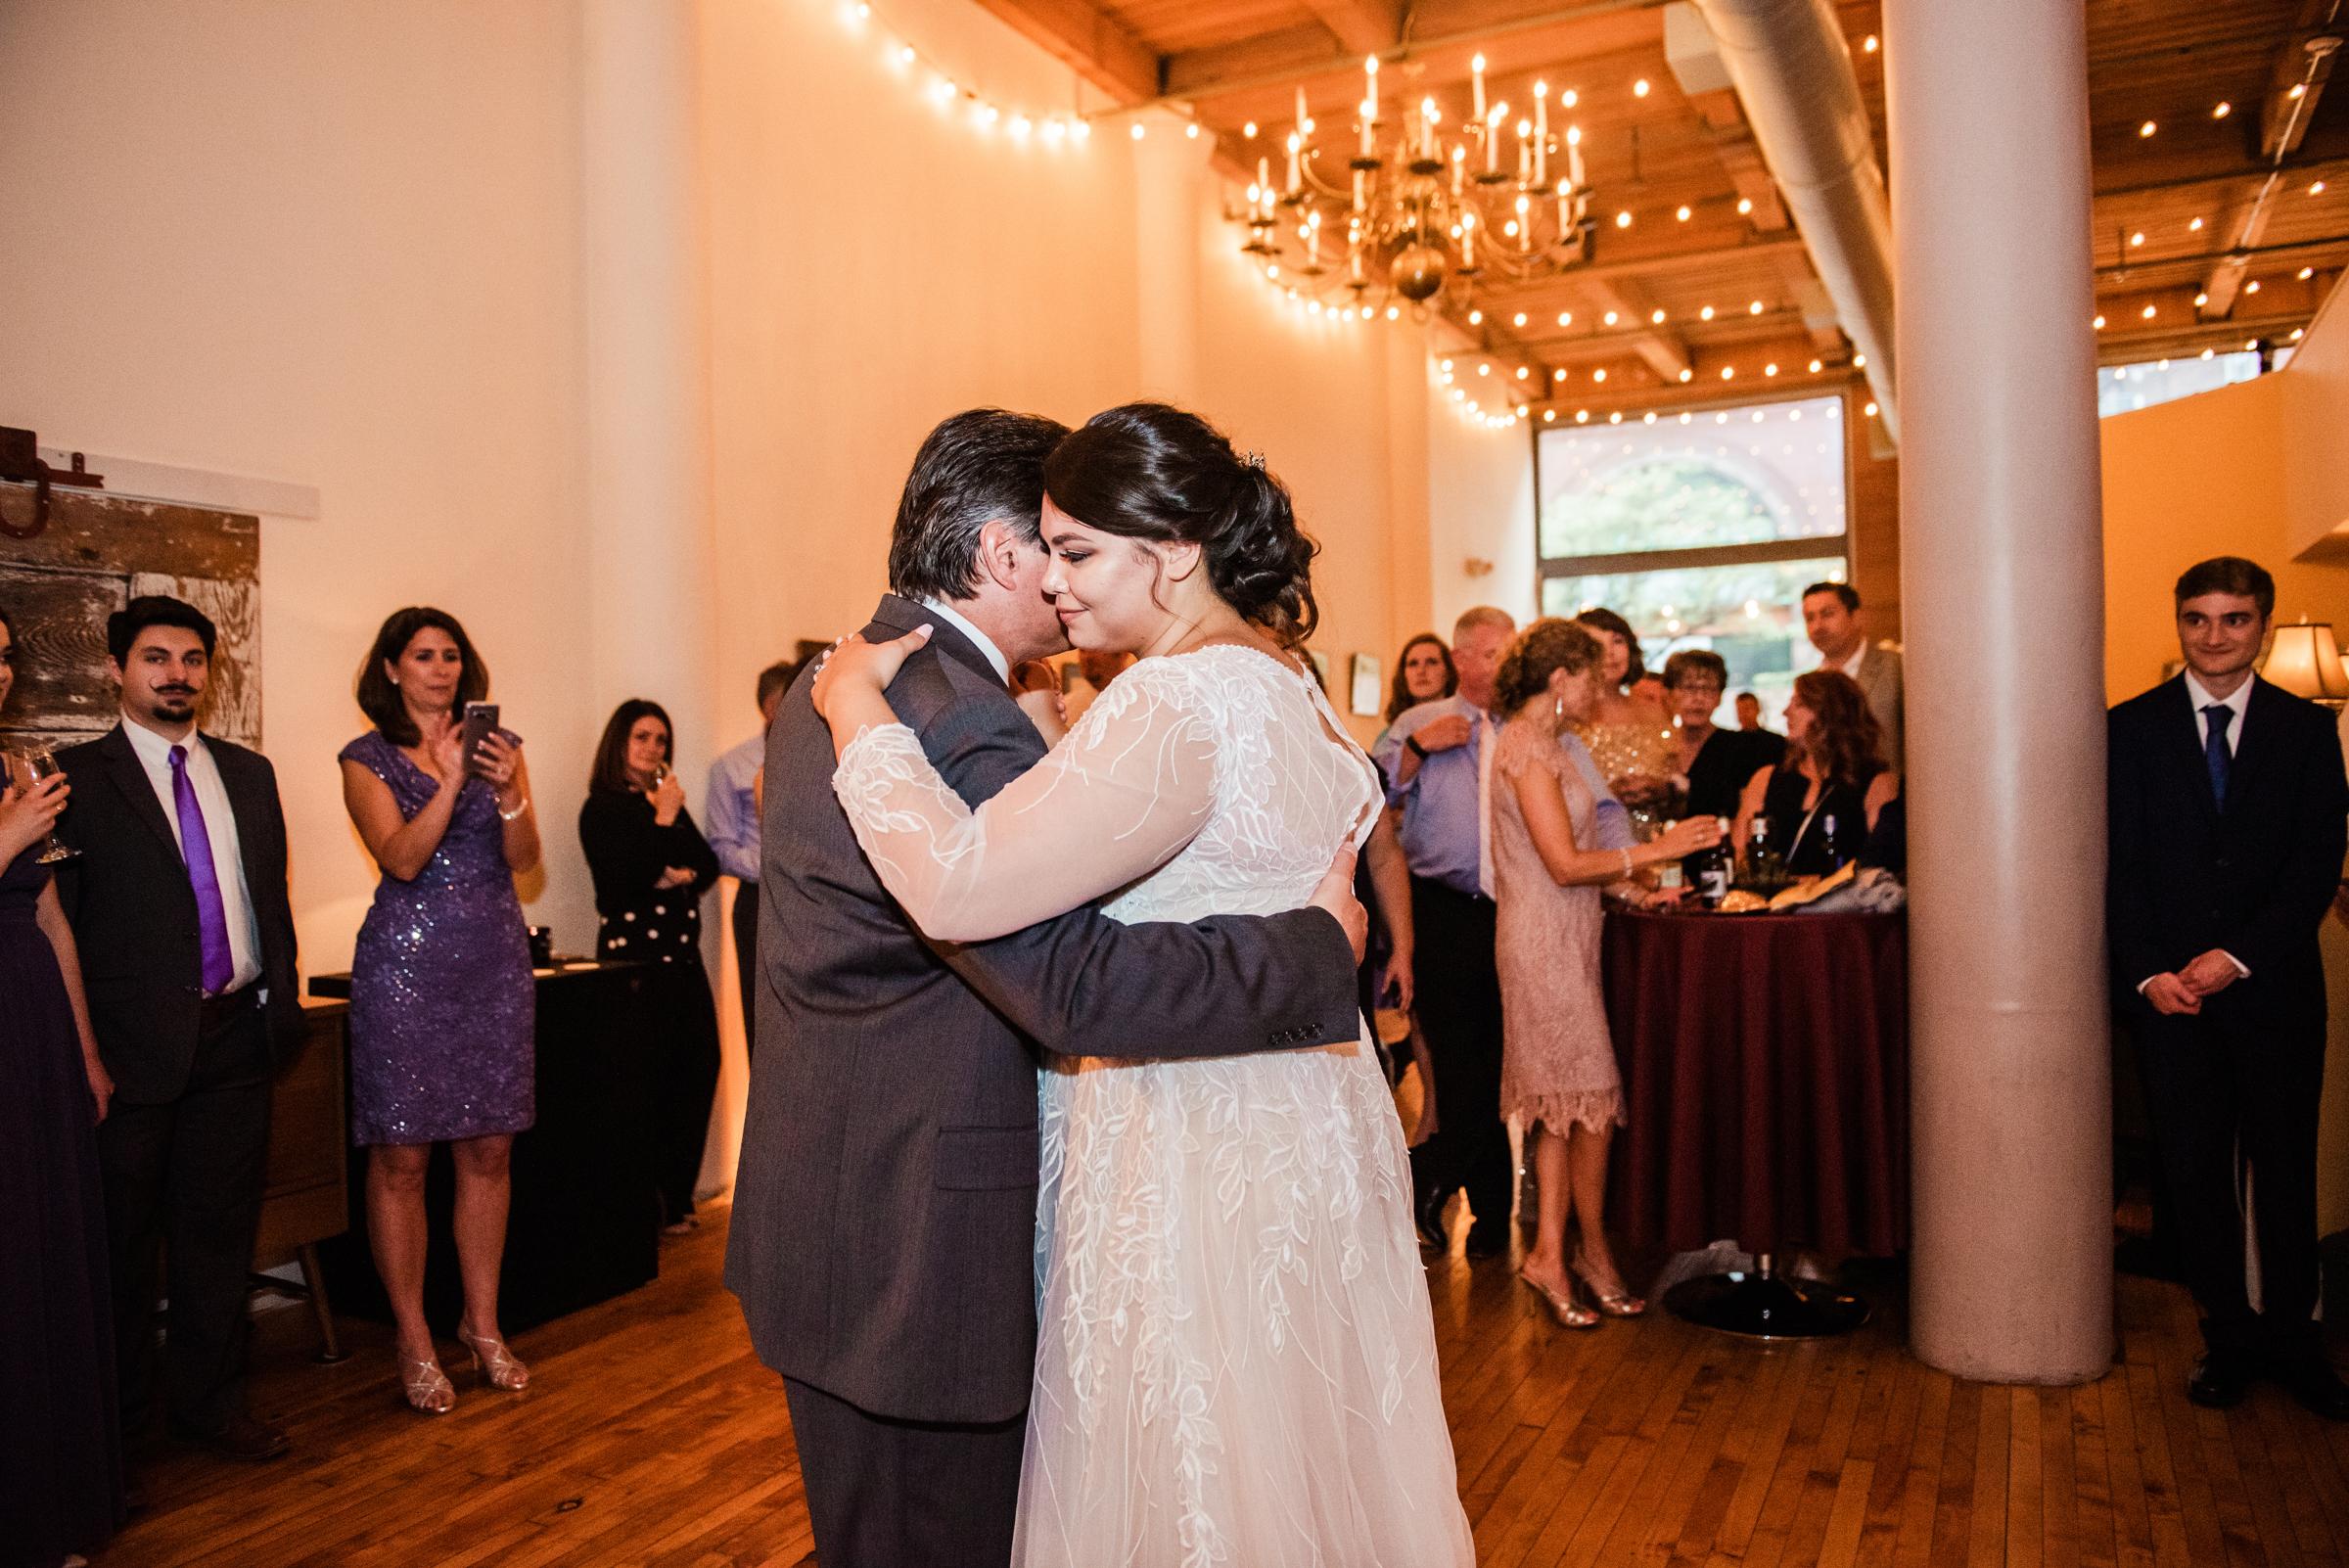 Studio_180_Lamberton_Conservatory_Rochester_Wedding_JILL_STUDIO_Rochester_NY_Photographer_DSC_9172.jpg